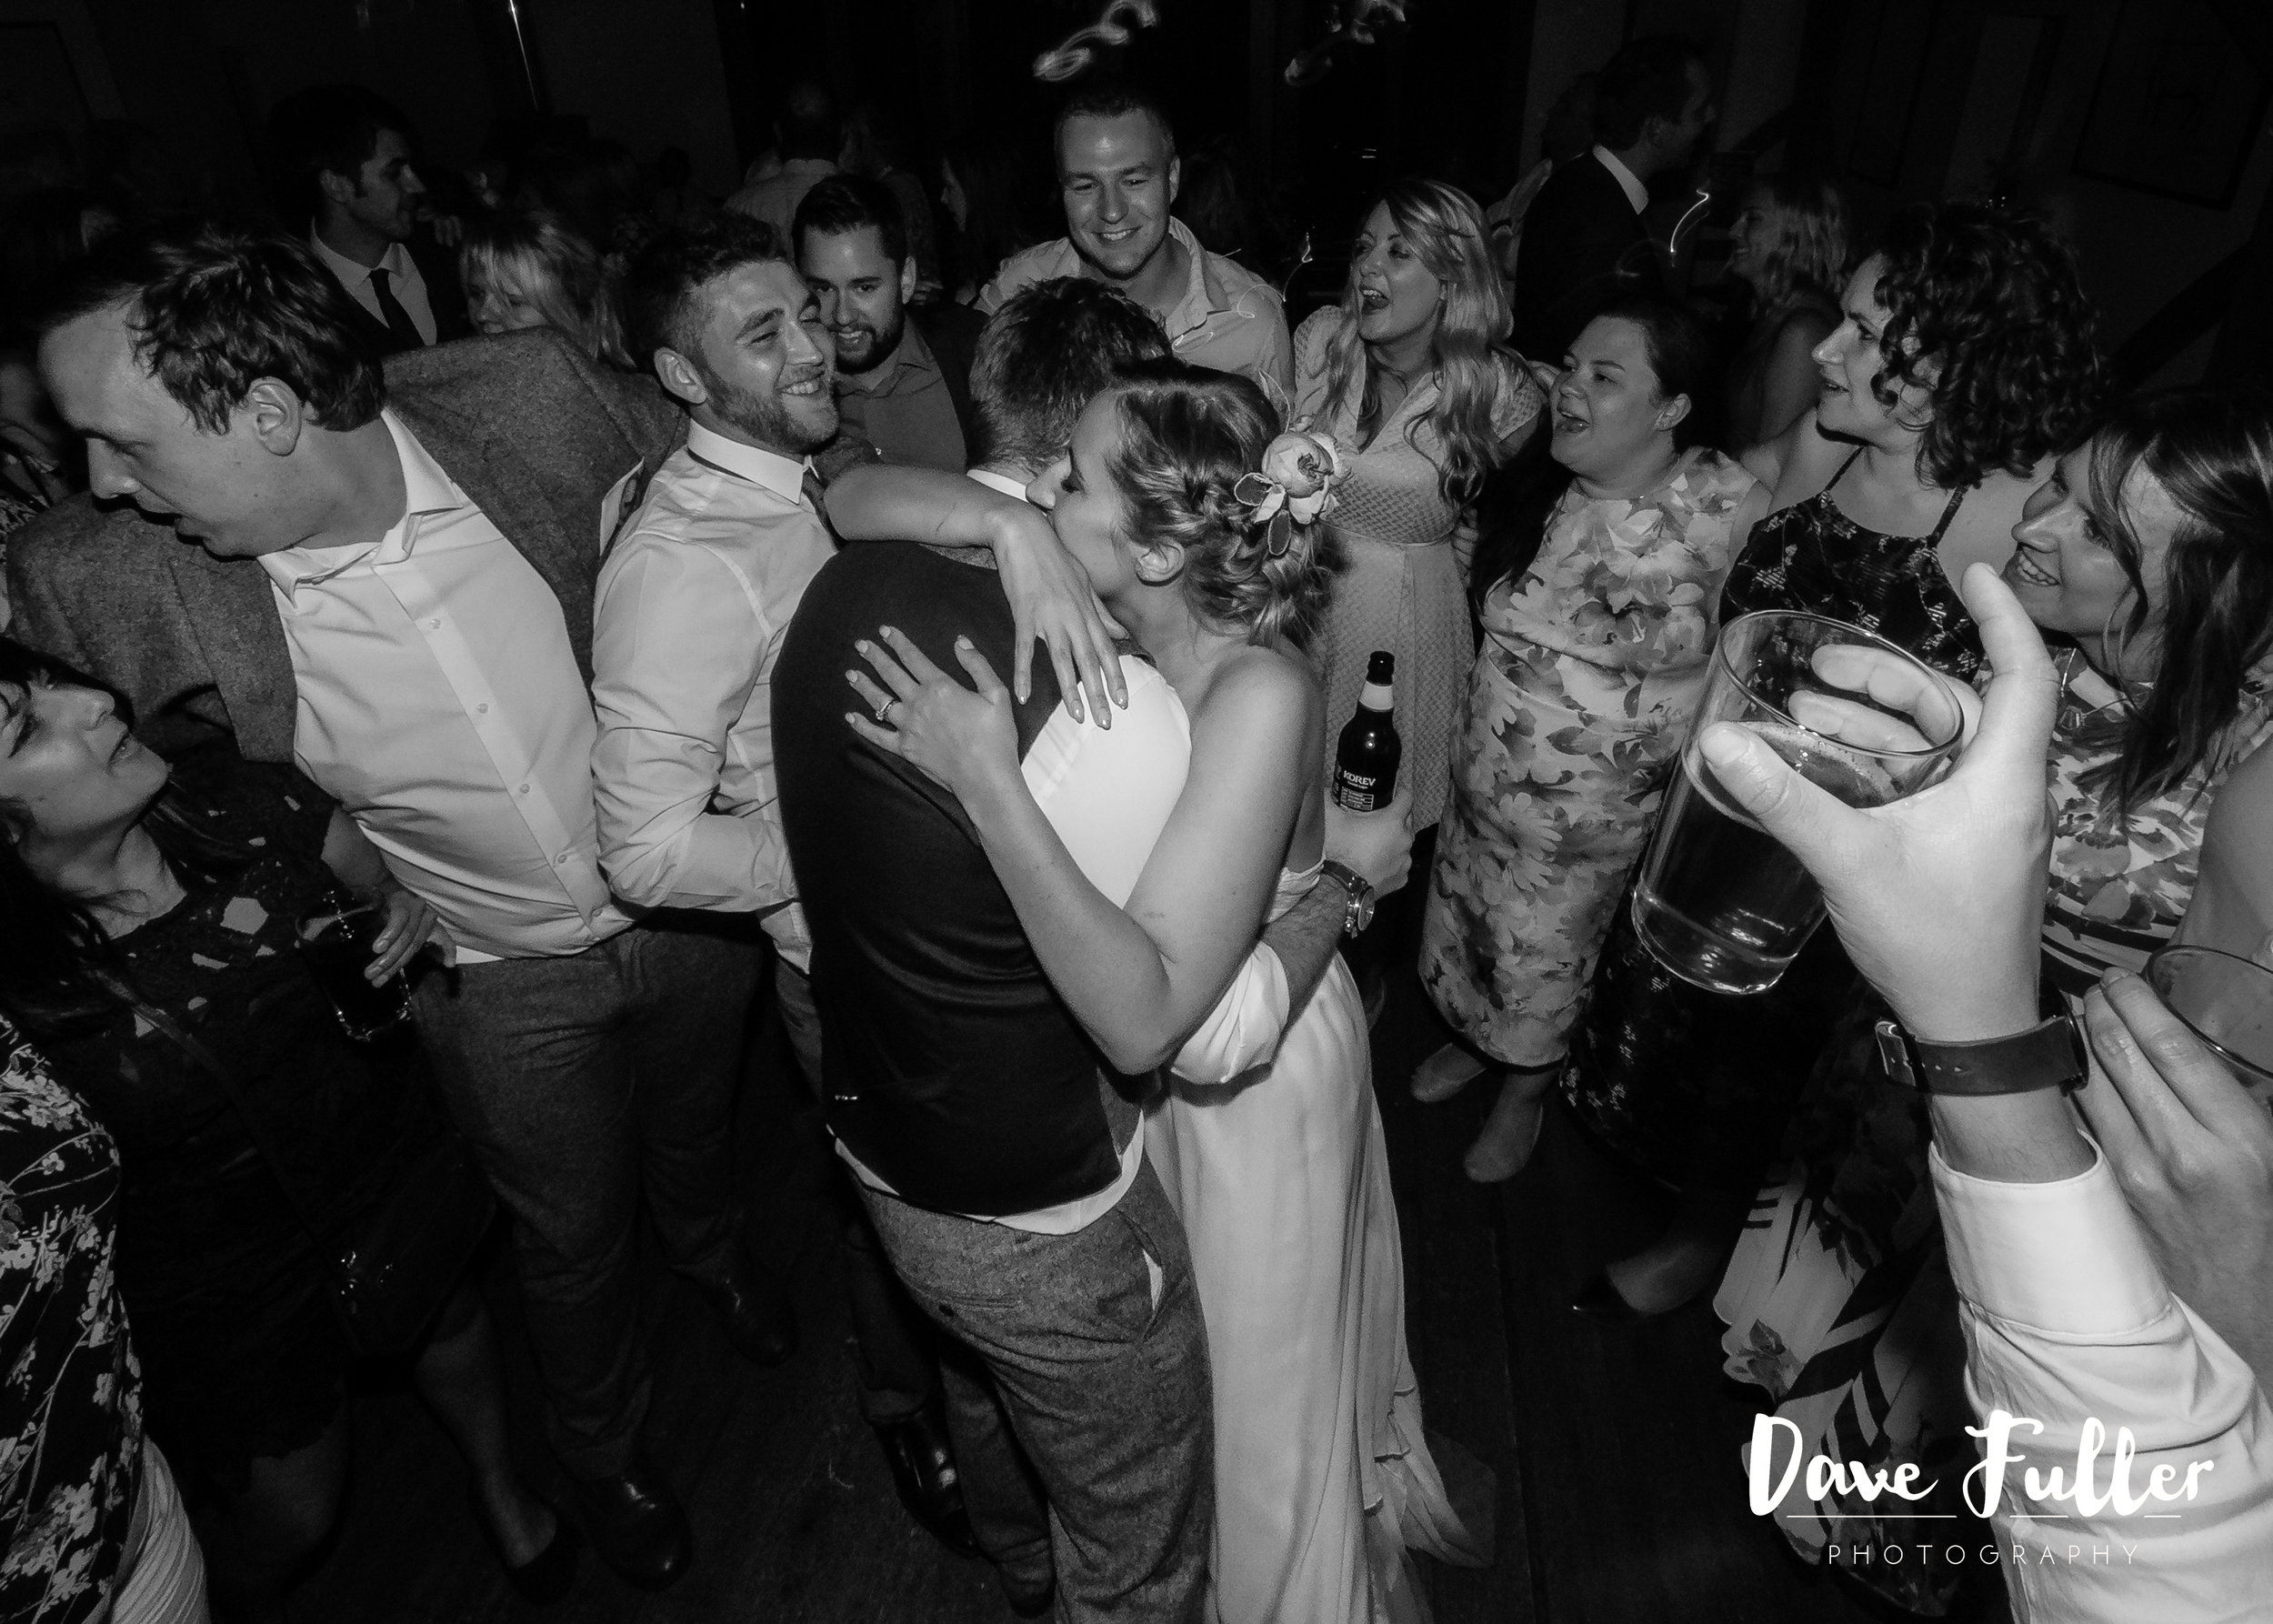 Nottingham Wedding PhotographerMckellar-Savage2.jpg